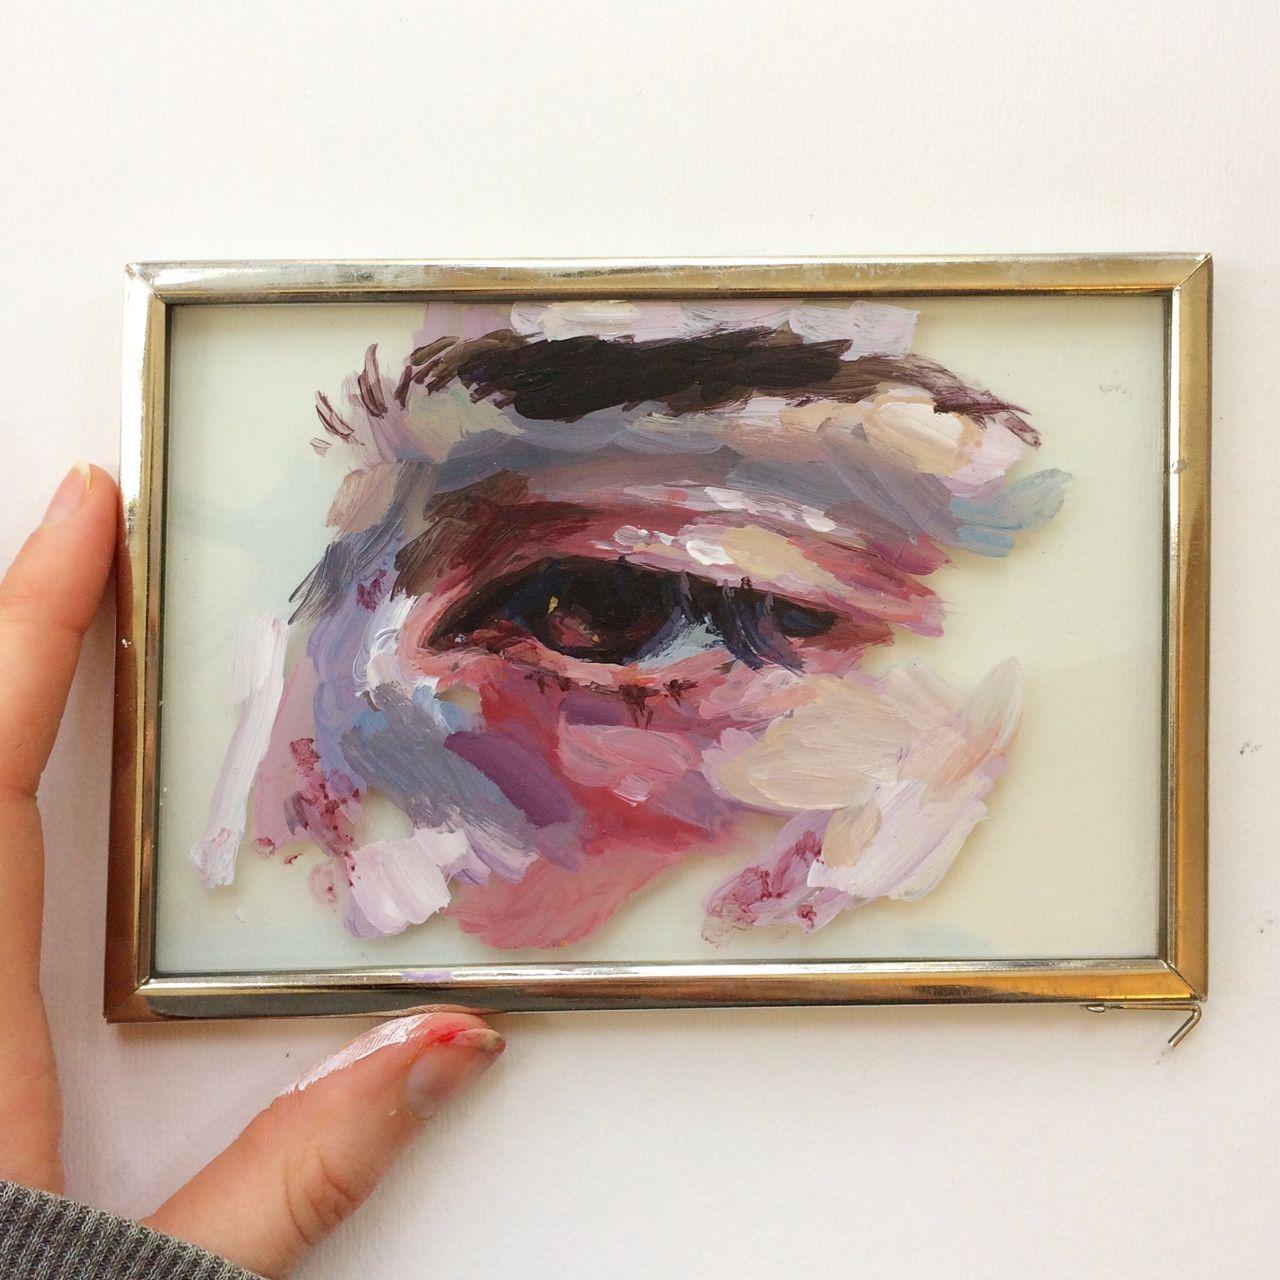 Pin de Kelly Wakefield en art | Pinterest | Pinturas, Dibujo y Acuarela